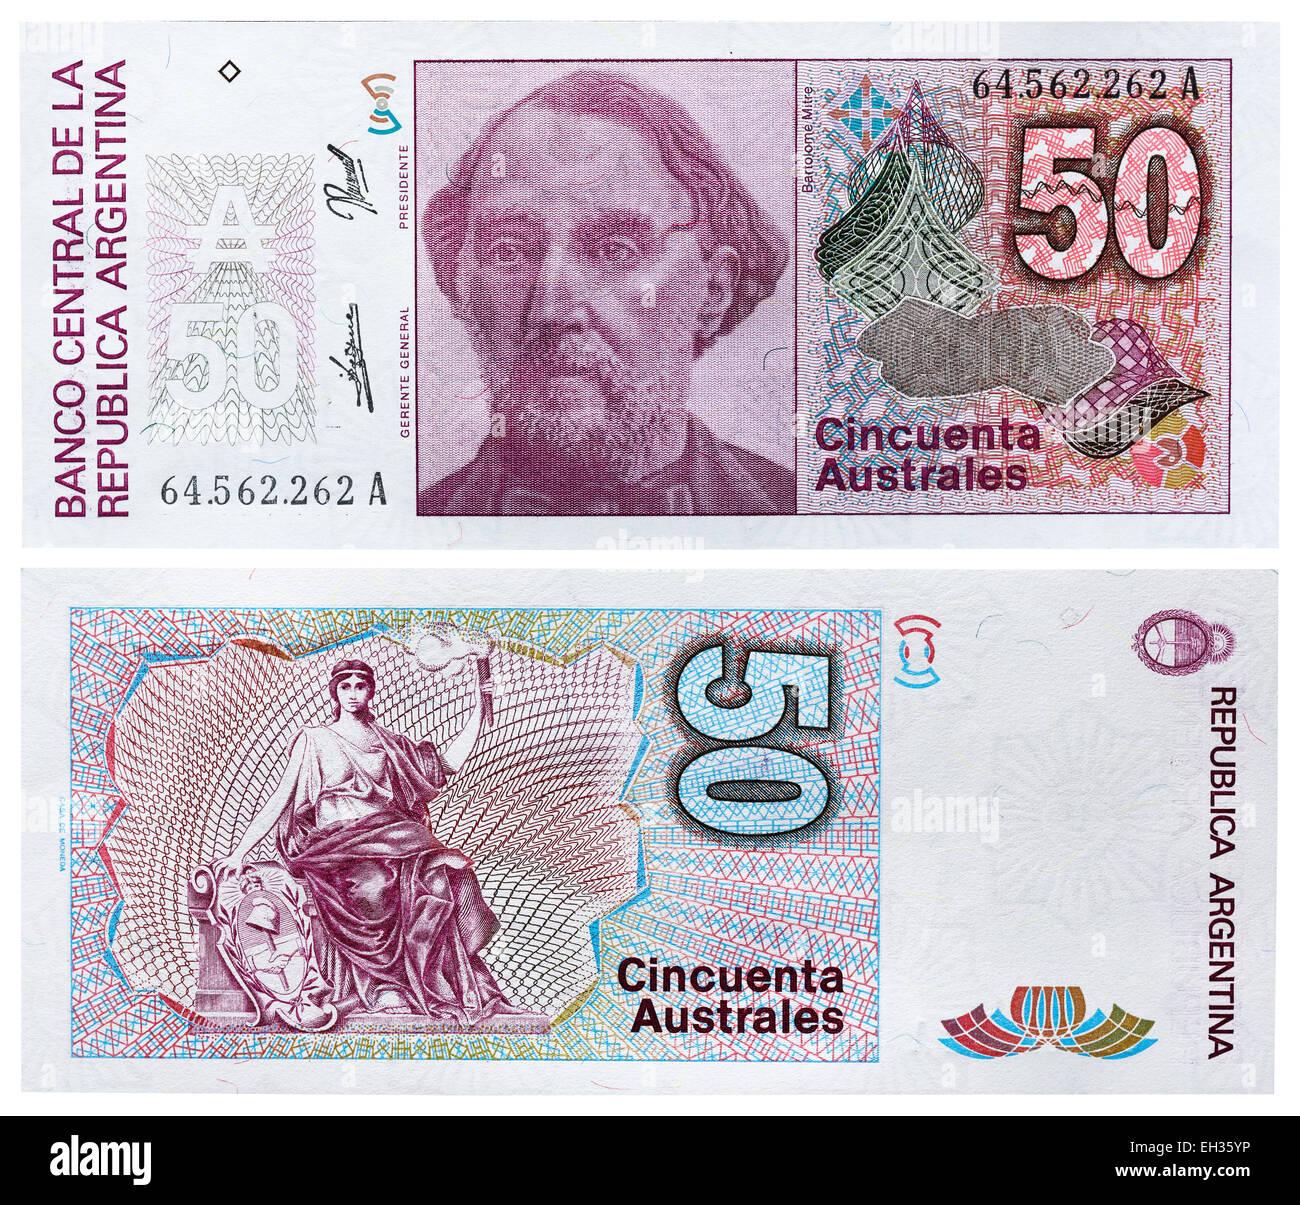 50 australes banknote, Bartolome Mitre, Argentina, 1986 - Stock Image